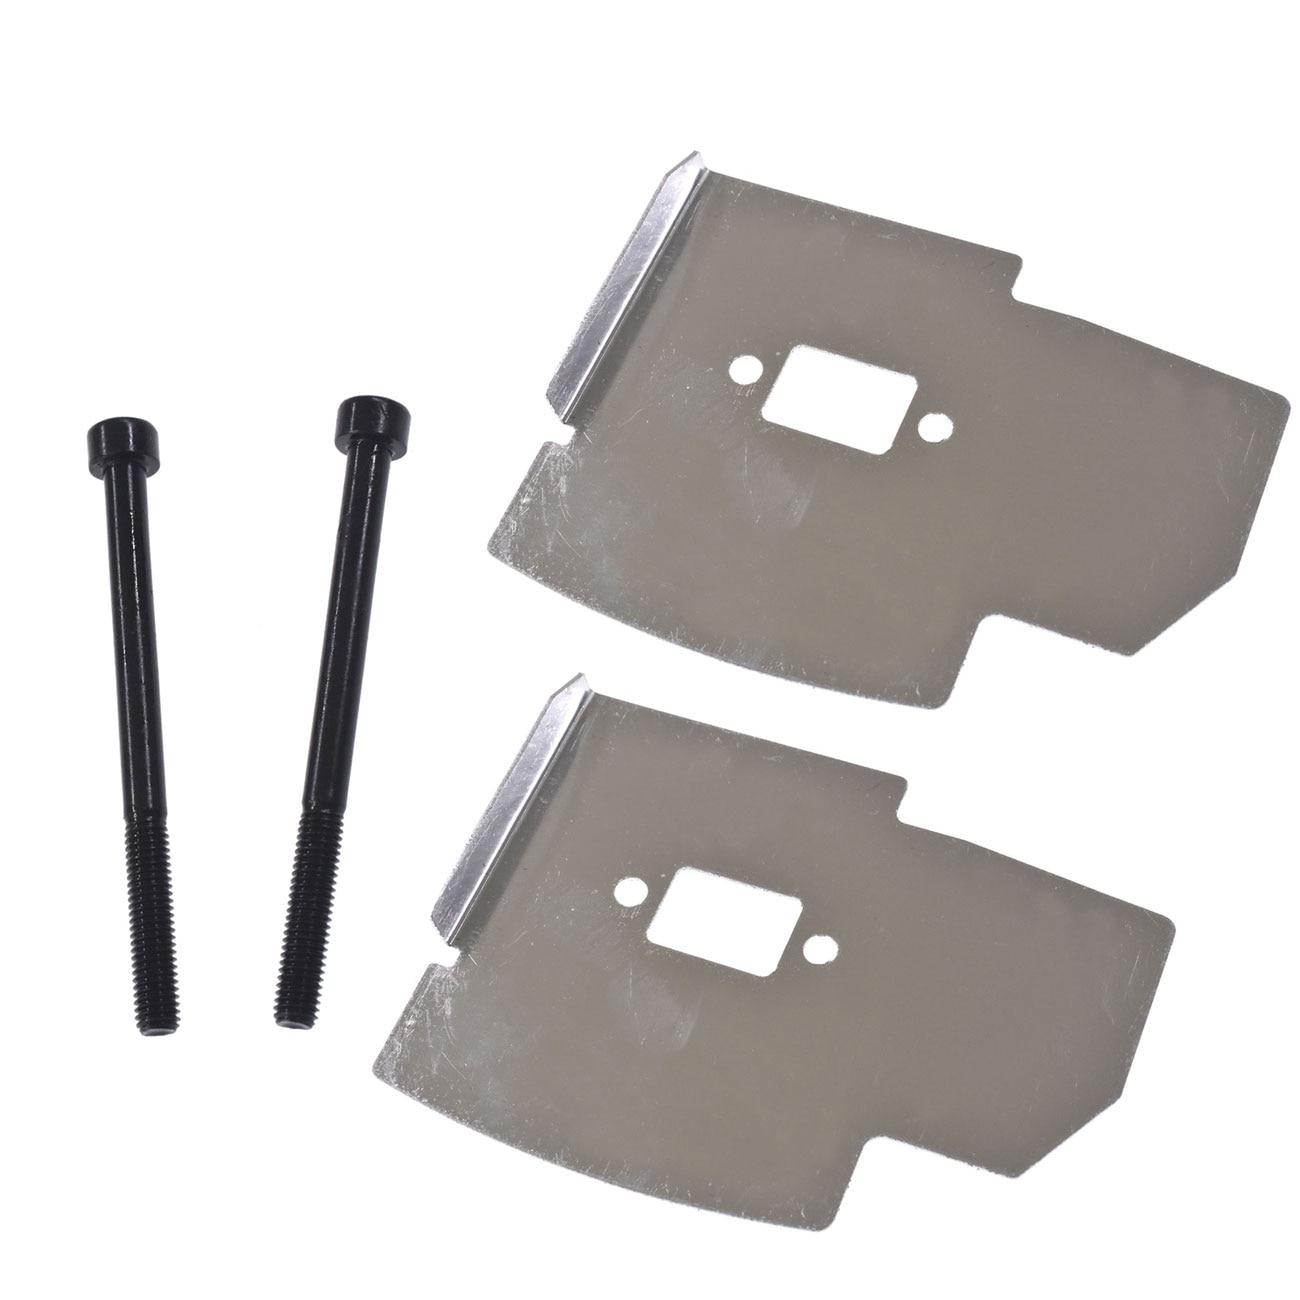 Muffler Heat Shield Deflector Bolts To For ZENOAH G35L G45L HUSQVARNA 143RII